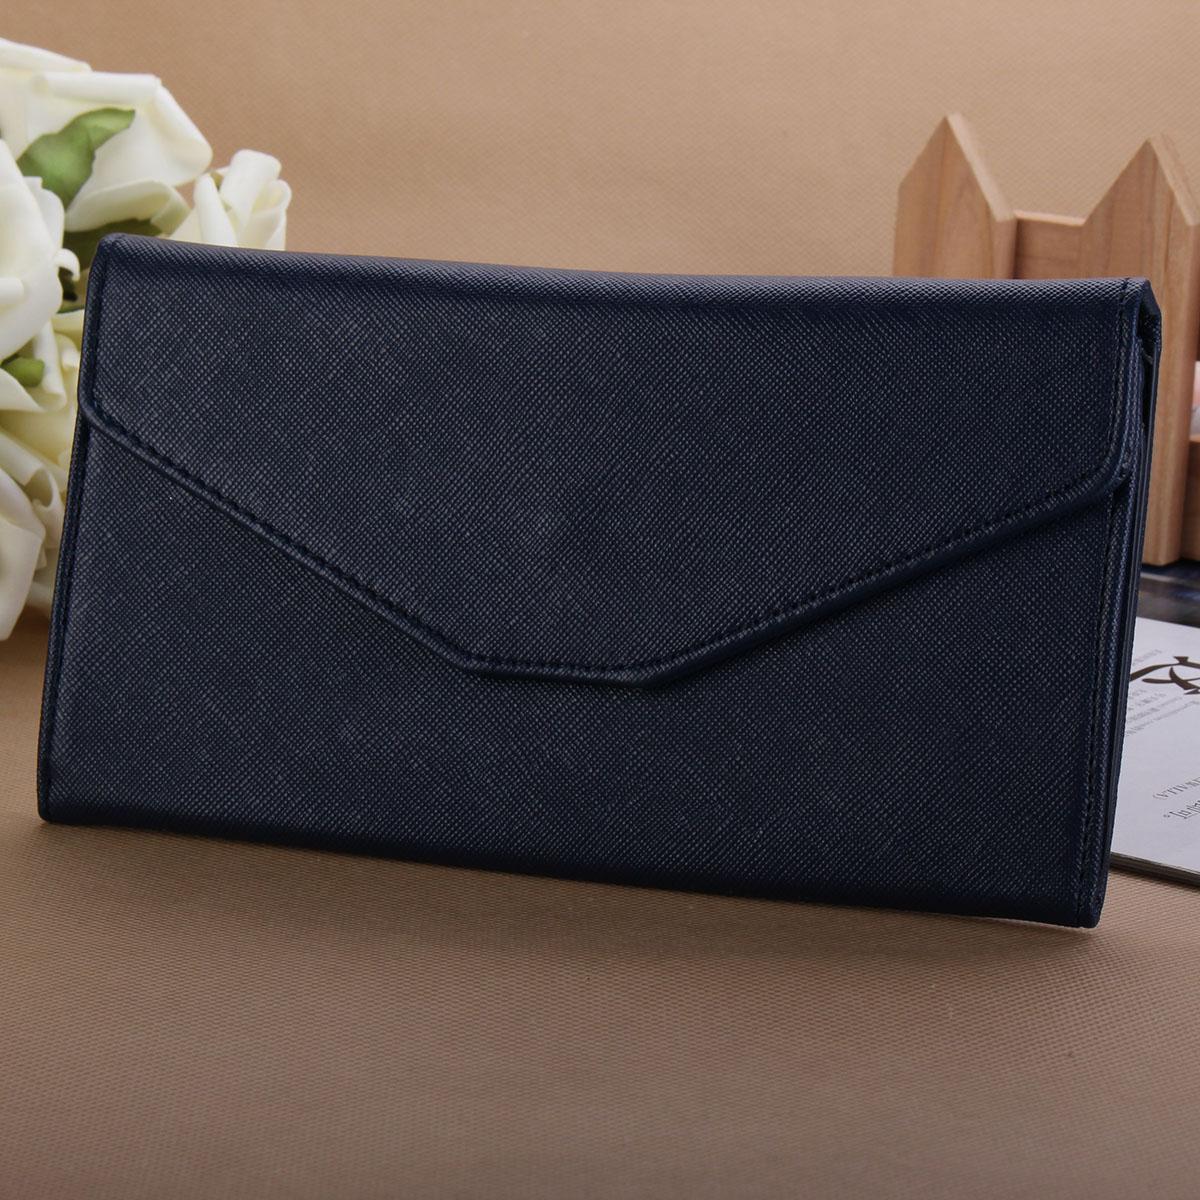 NEW Fashion Women Lady Long Wallet Card Holder Envelope Handbag Bag Clutch Purse